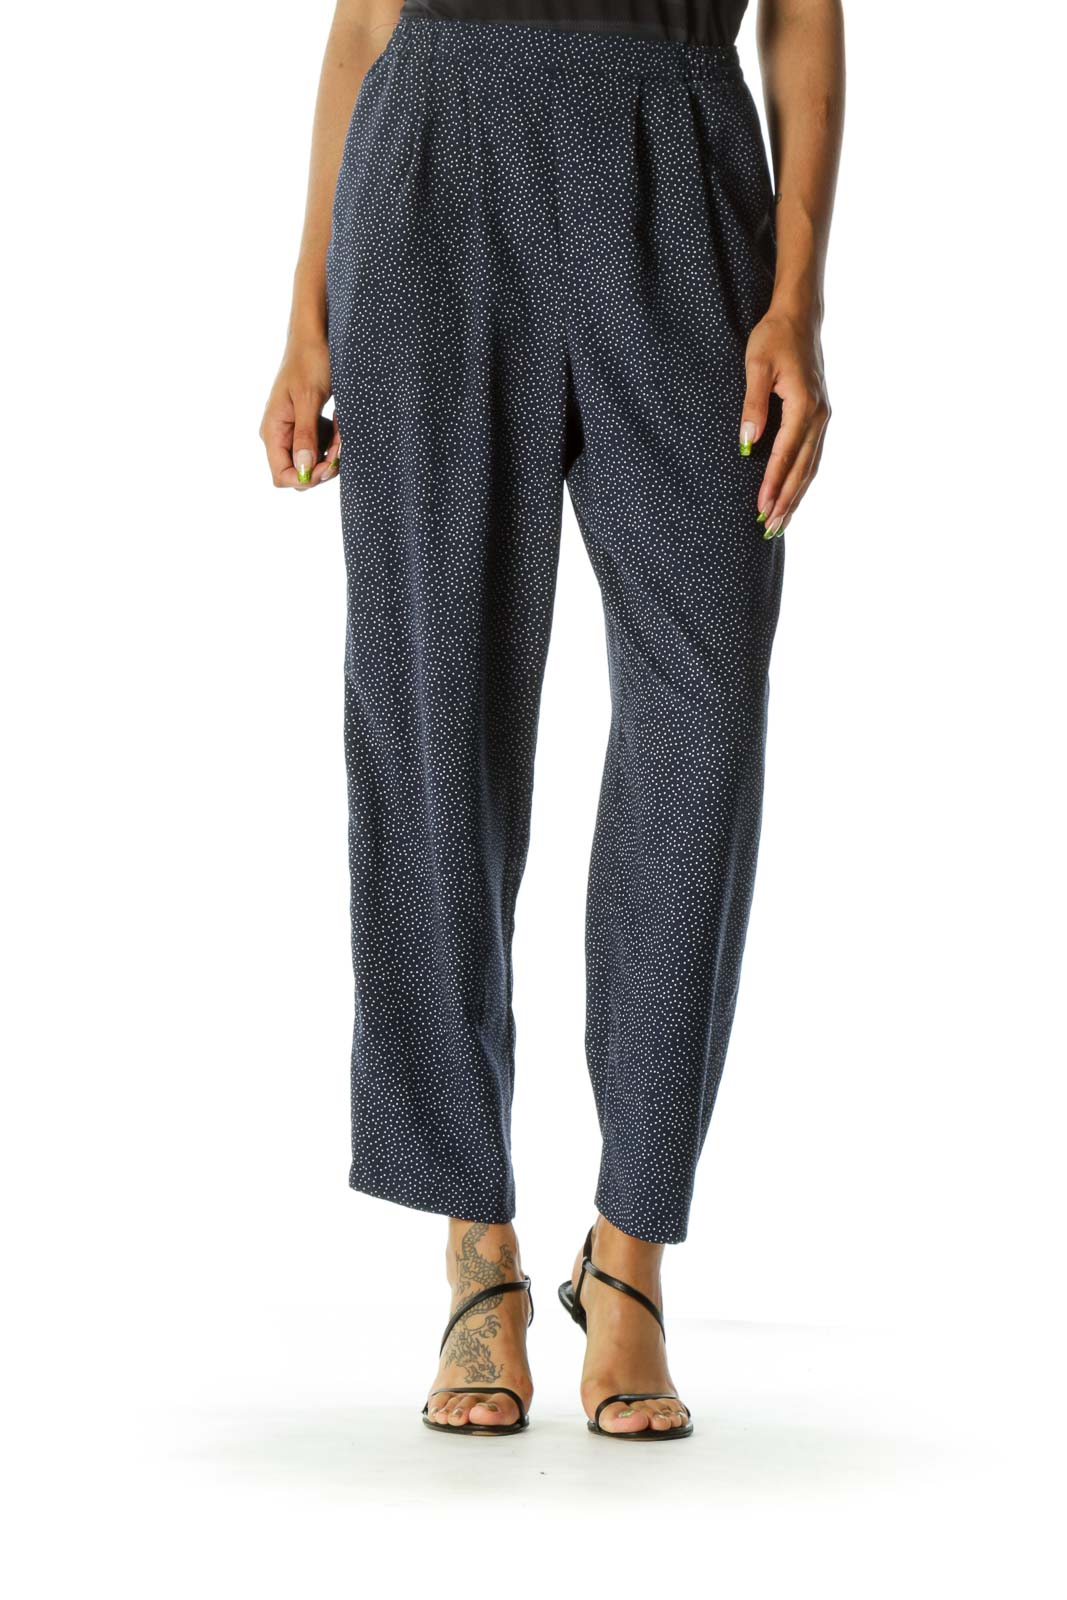 Blue Polka Dots Wide-leg Pants Front